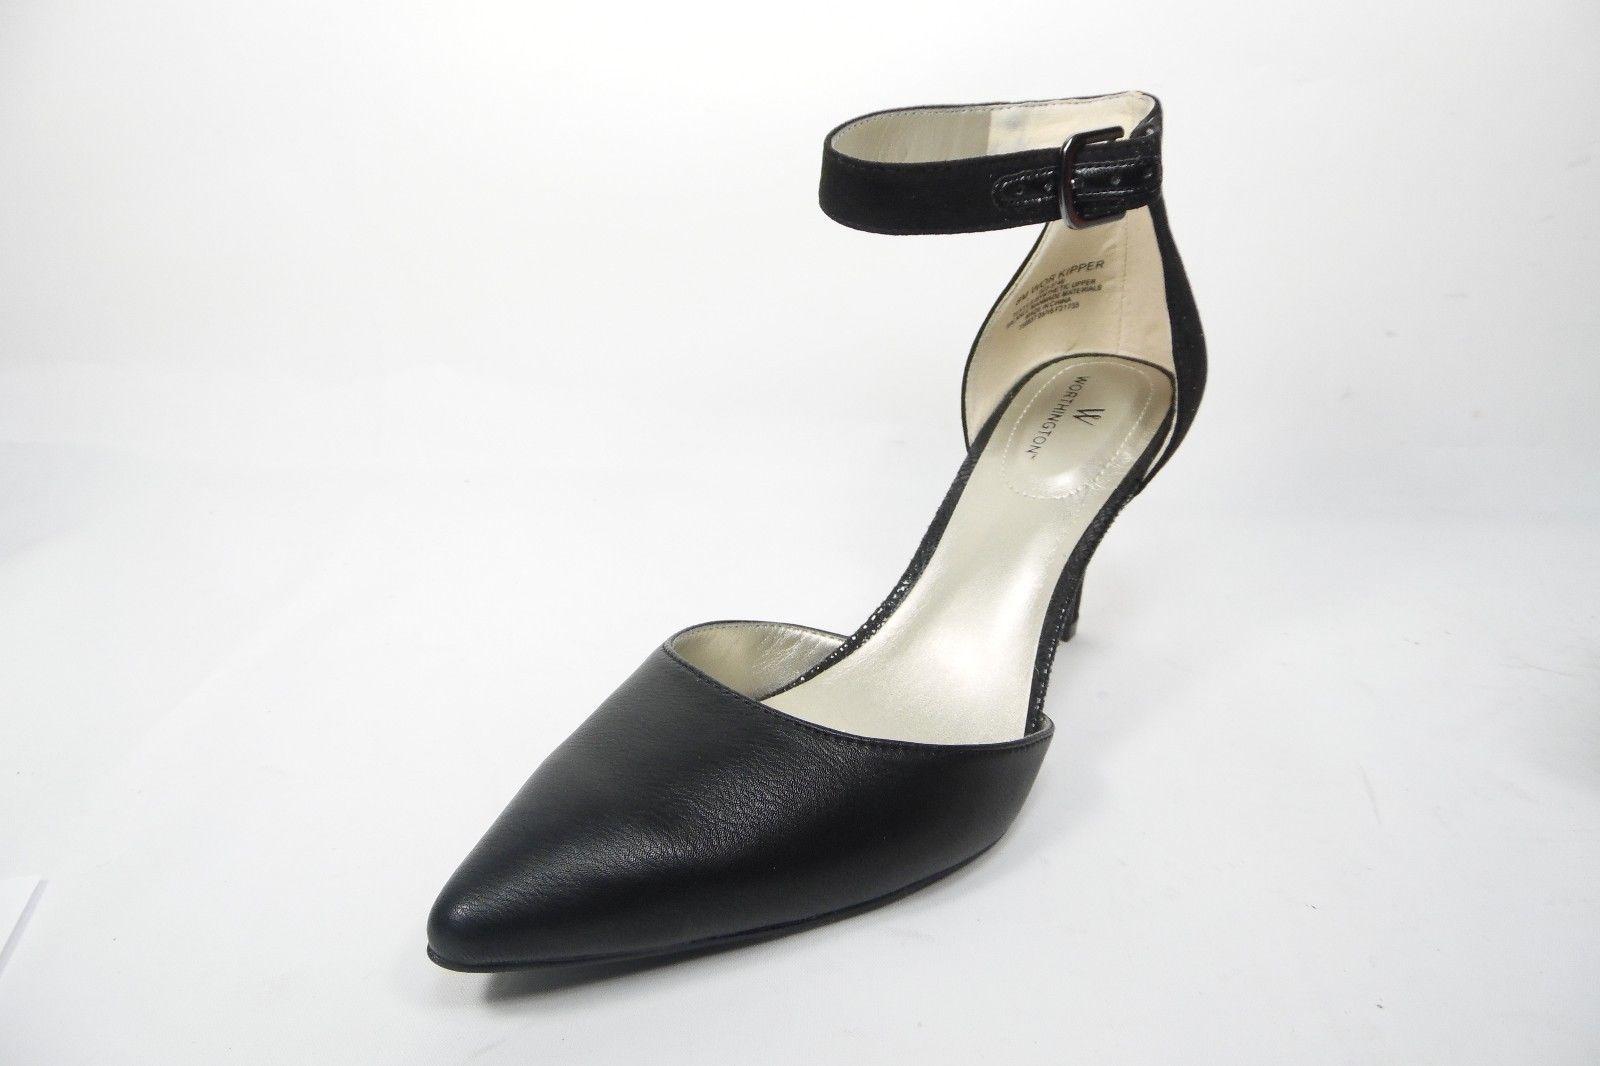 Worthington Kipper Pointed-Toe Pumps Black and 47 similar items